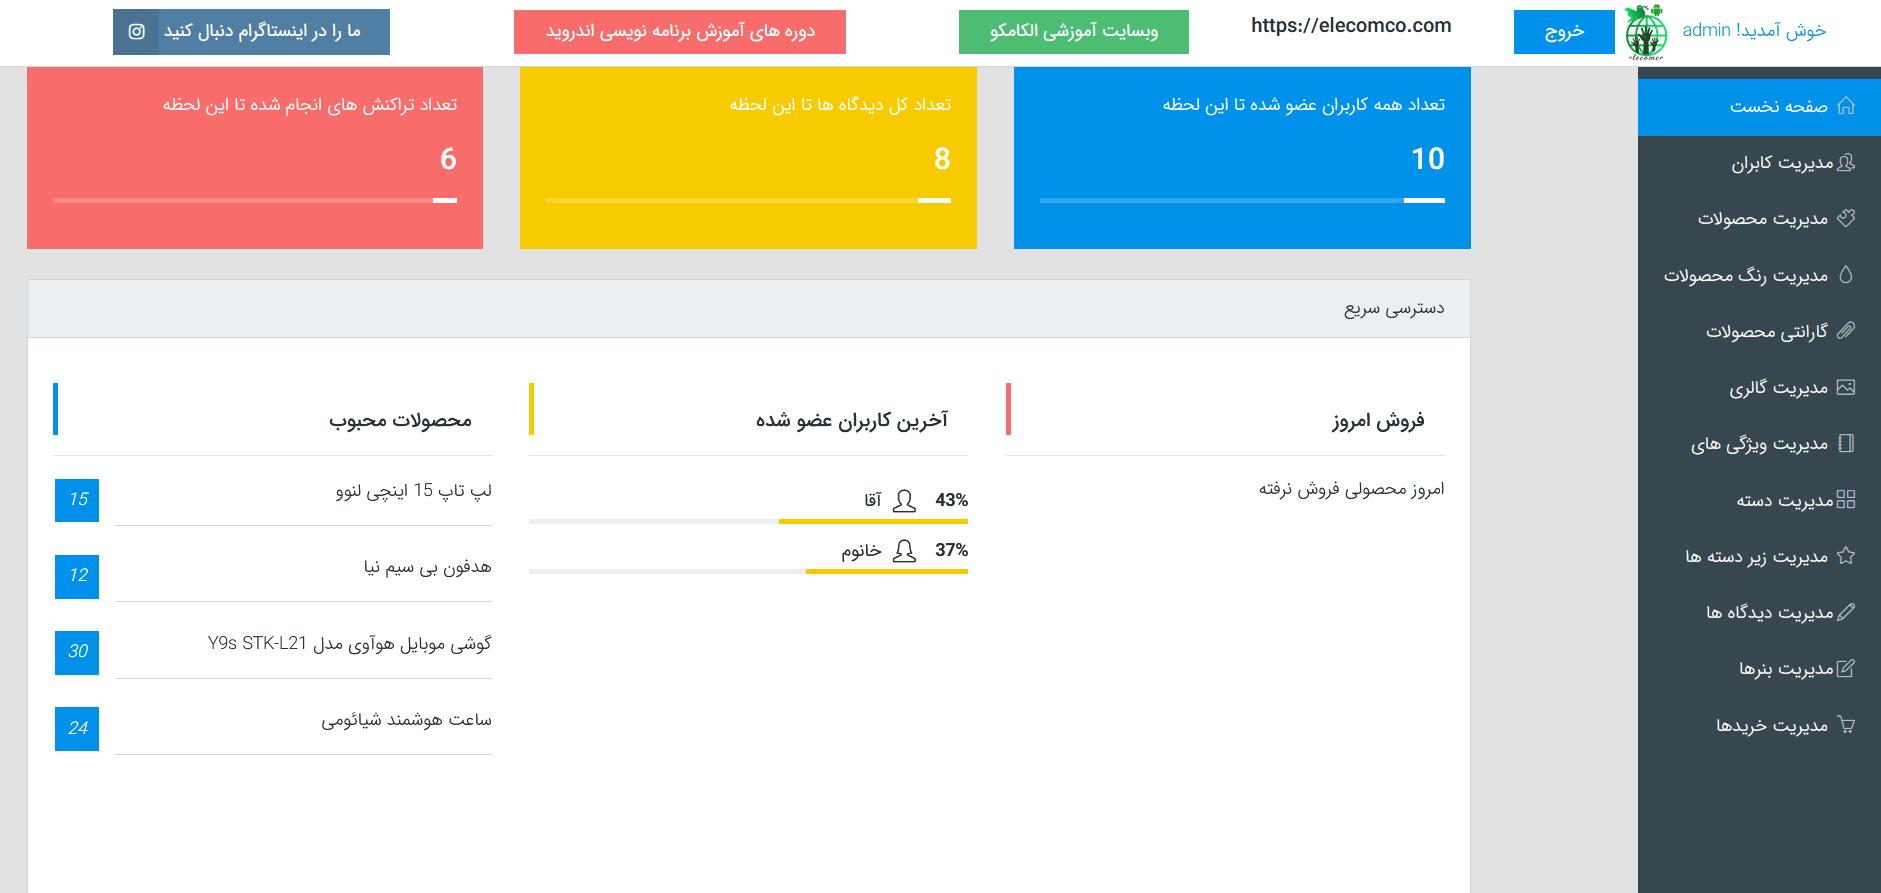 پنل مدیریت اپلیکیشن دیجی کالا - الکامکو